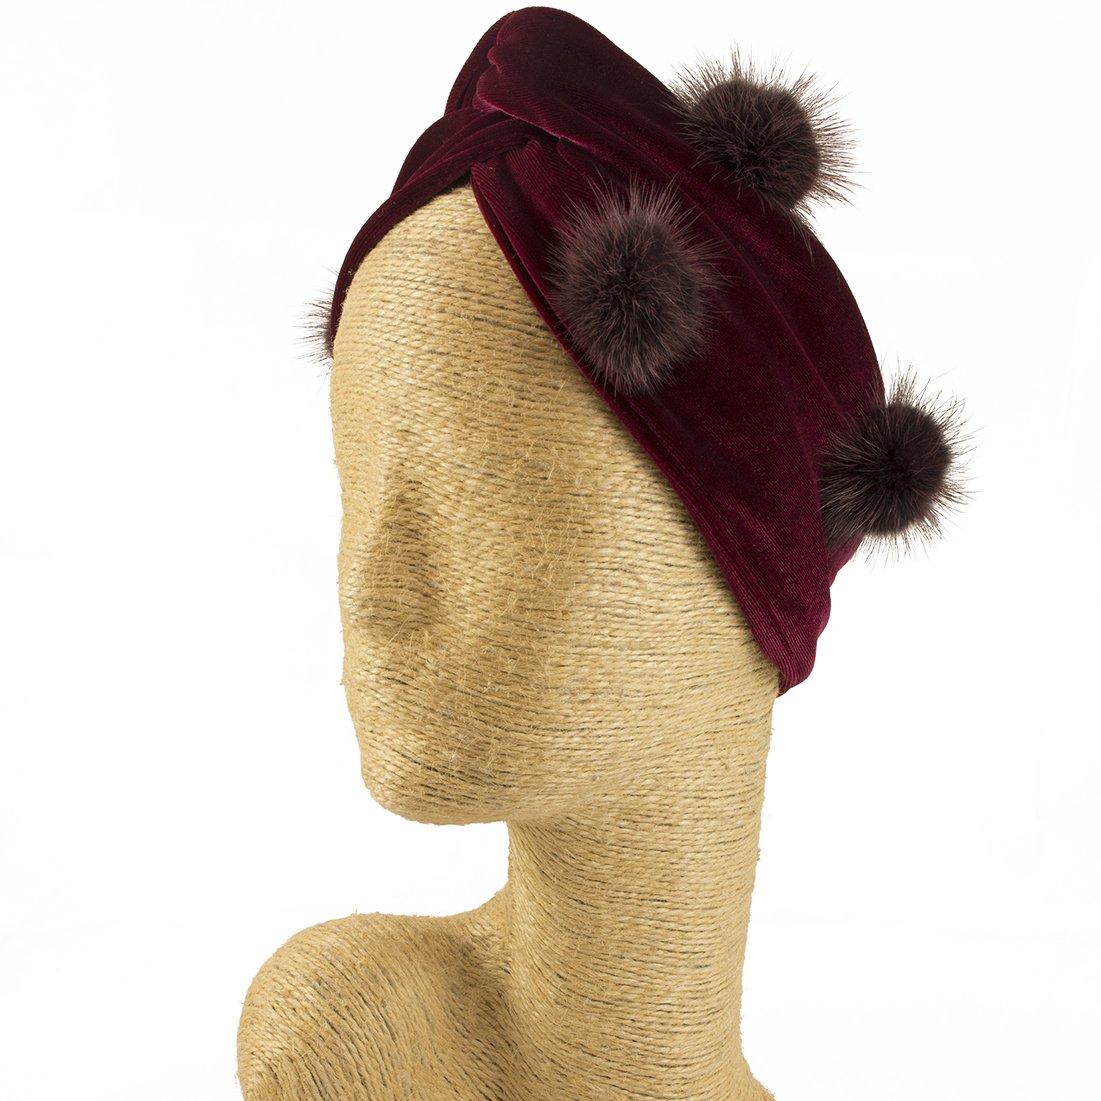 Fascinator, Velvet Headbands, Millinery, Worldwide Free Shipment, Delivery in 2 Days, Customized Tailoring, Designer Fashion, Head wrap, Bohemian Accessories, Burgundy, Pom Pom, Boho Chic